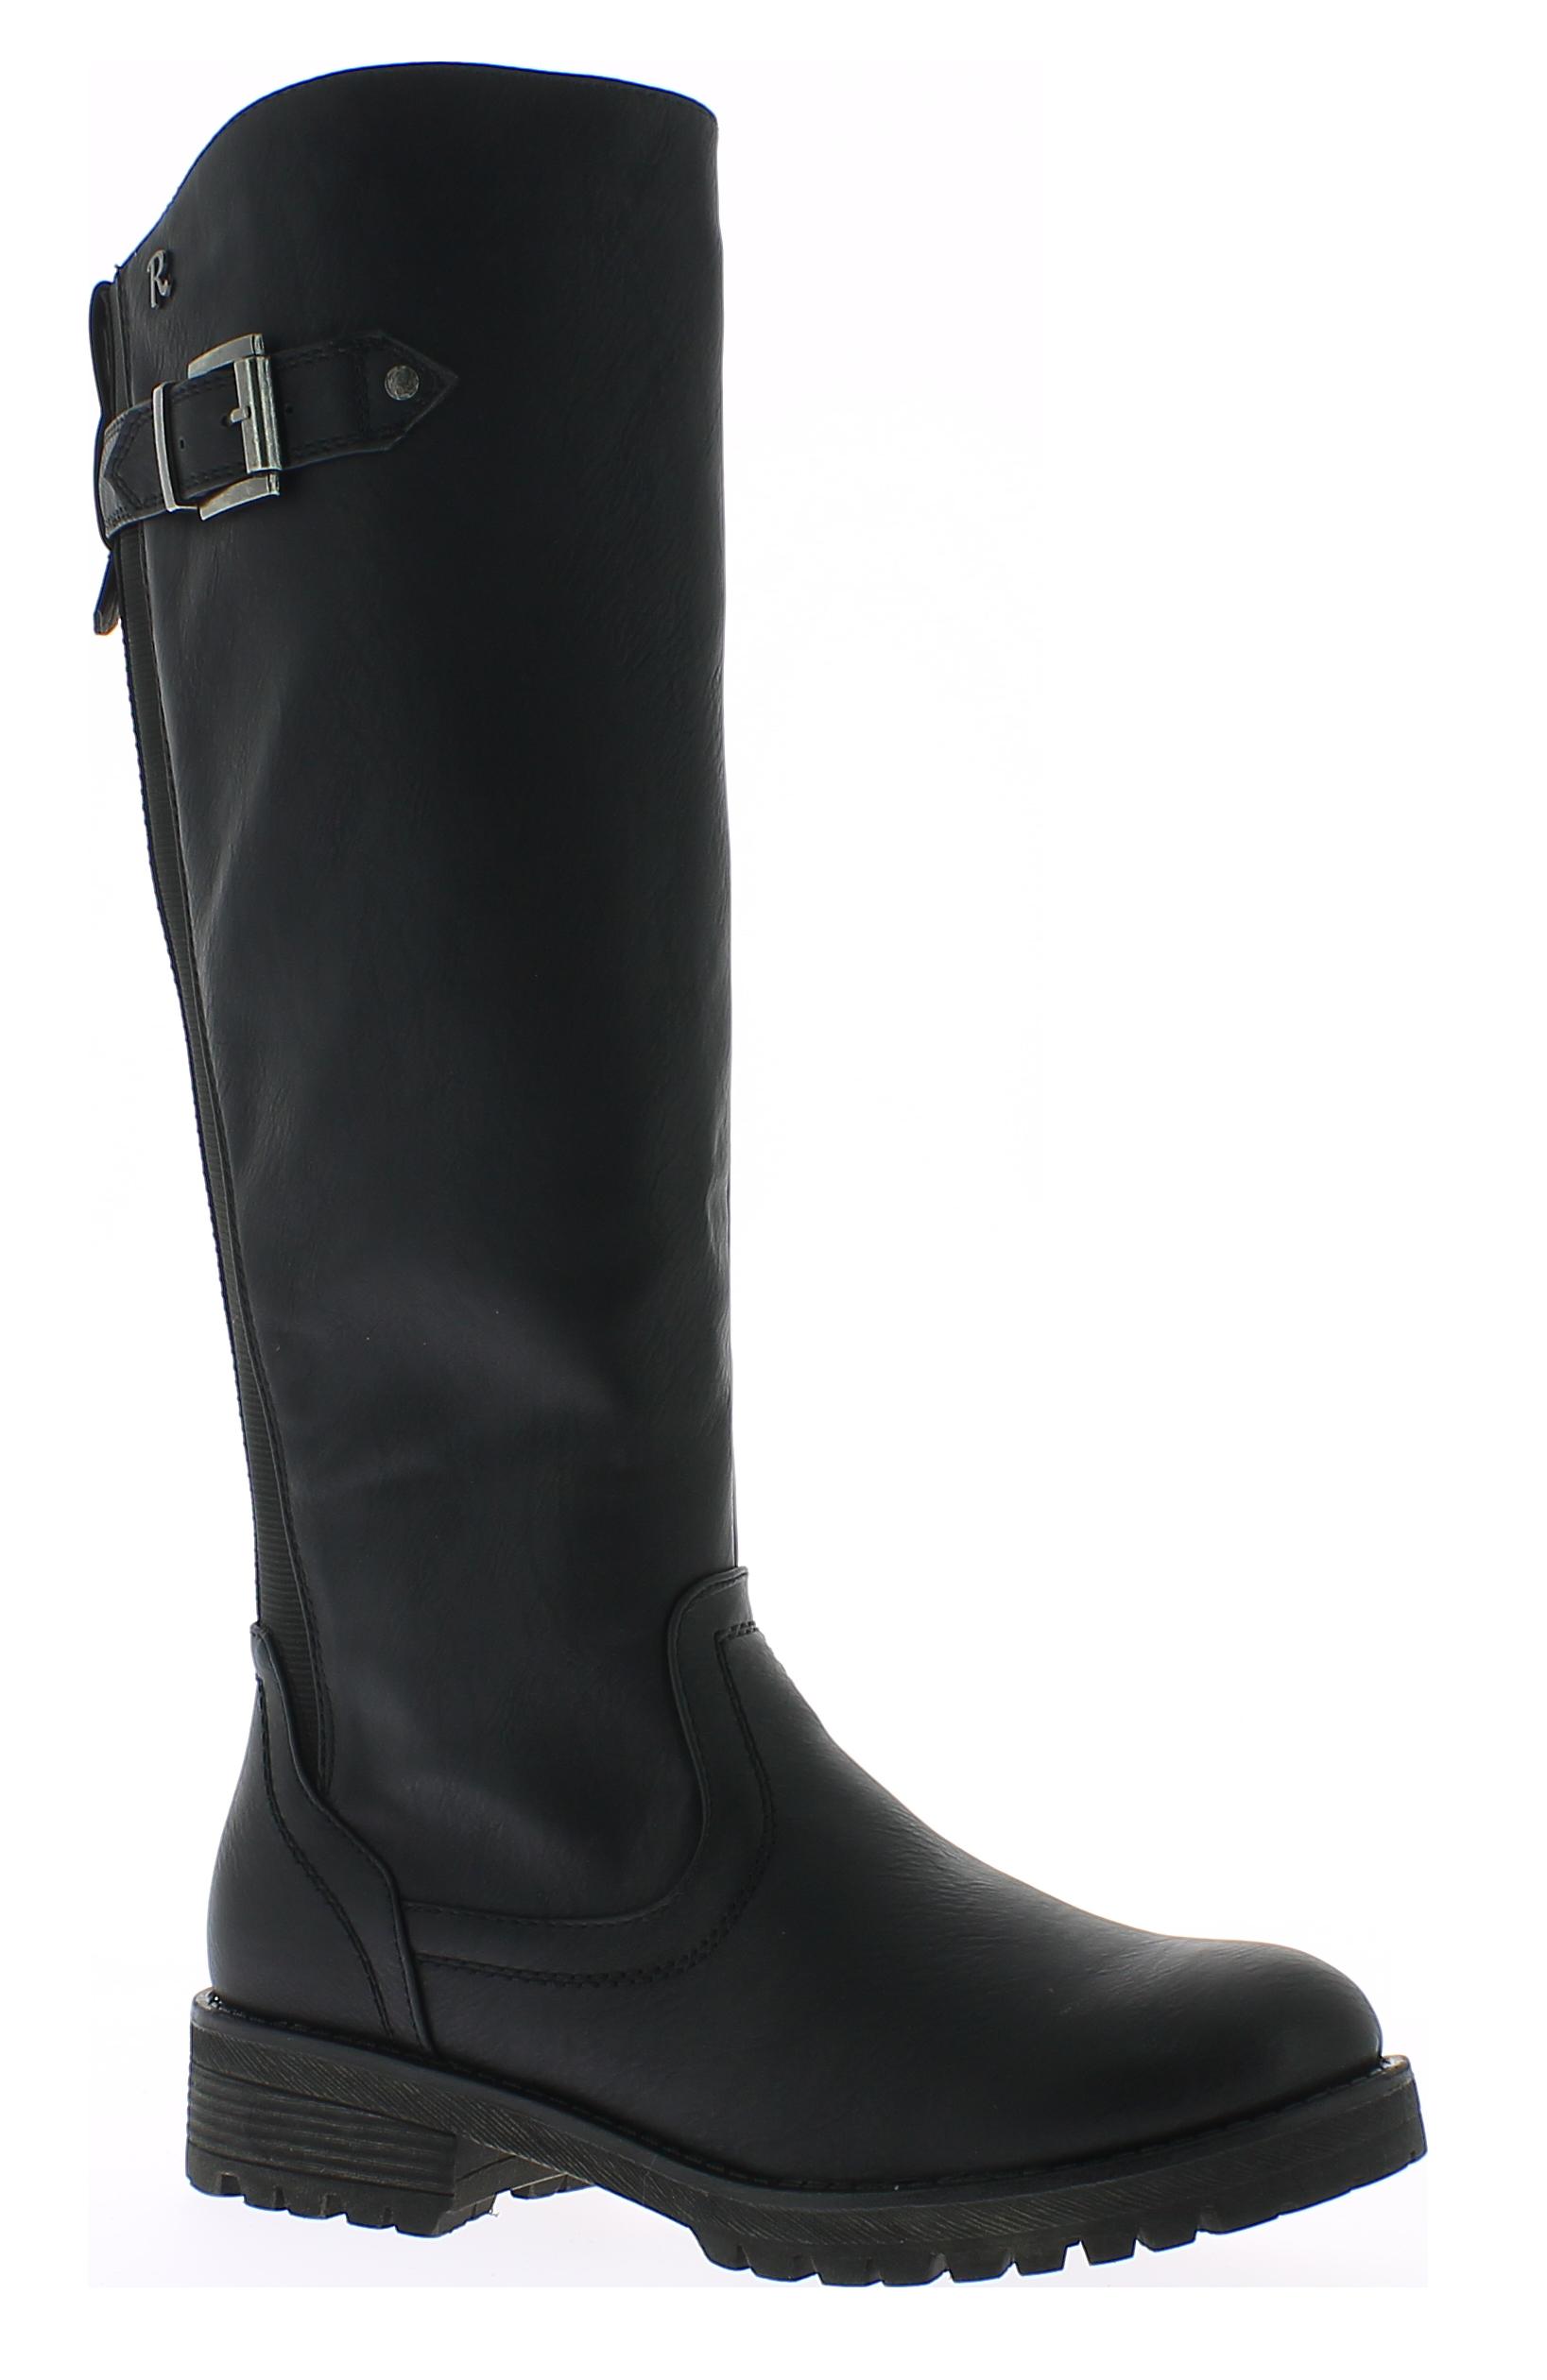 REFRESH Γυναικεία Μπότα 63166 Μαύρο - IqShoes - 63166 BLACK-black-39/1/15/25 παπούτσια  γυναικεία μποτάκια